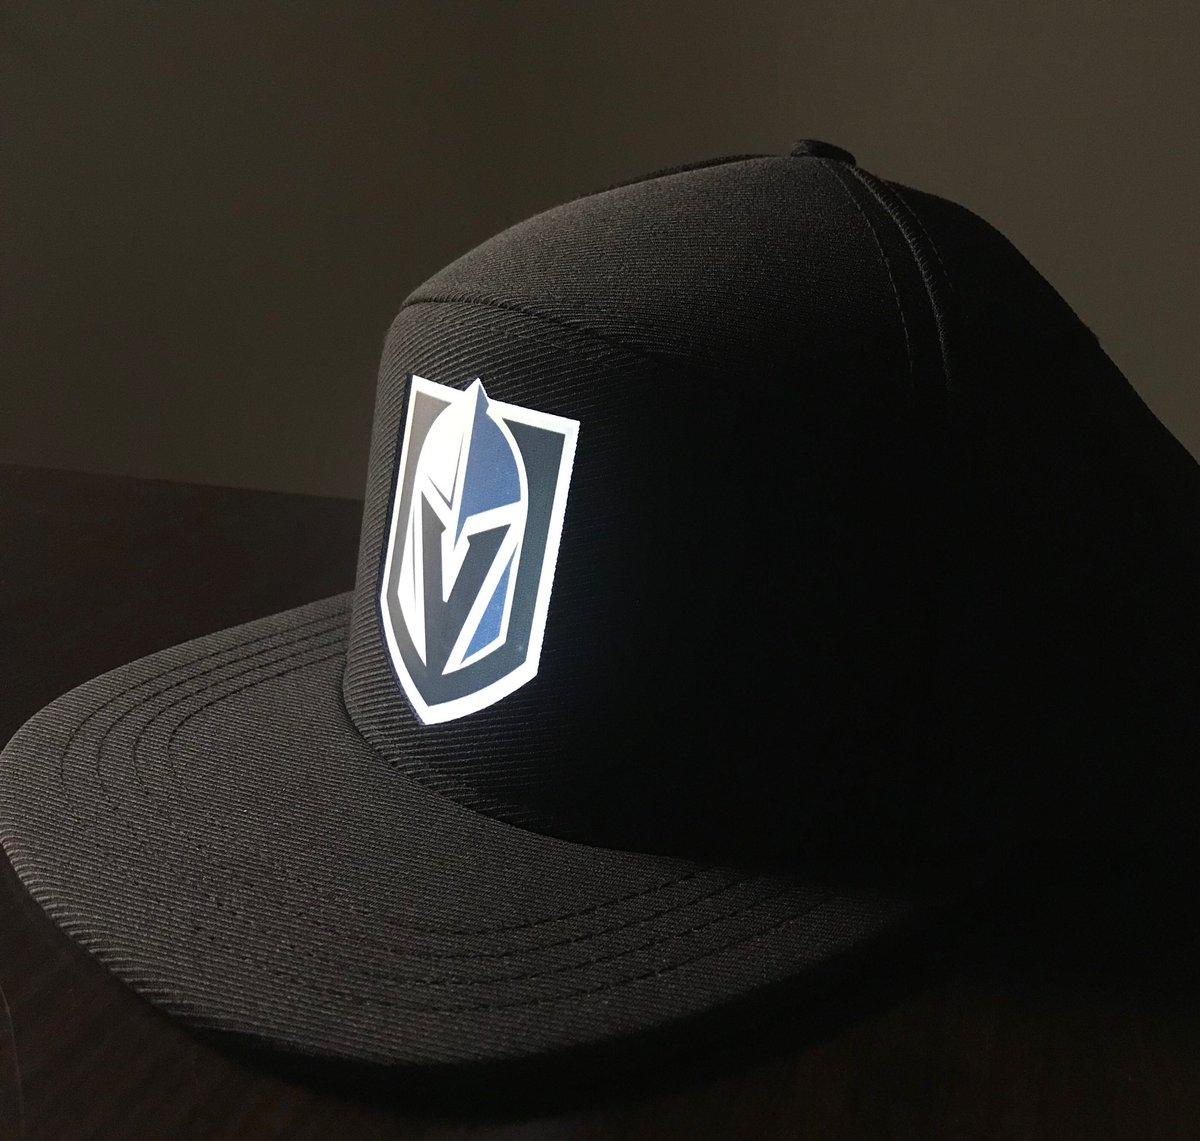 68f1759f6b8 Vegas Golden Knights Gear on Twitter